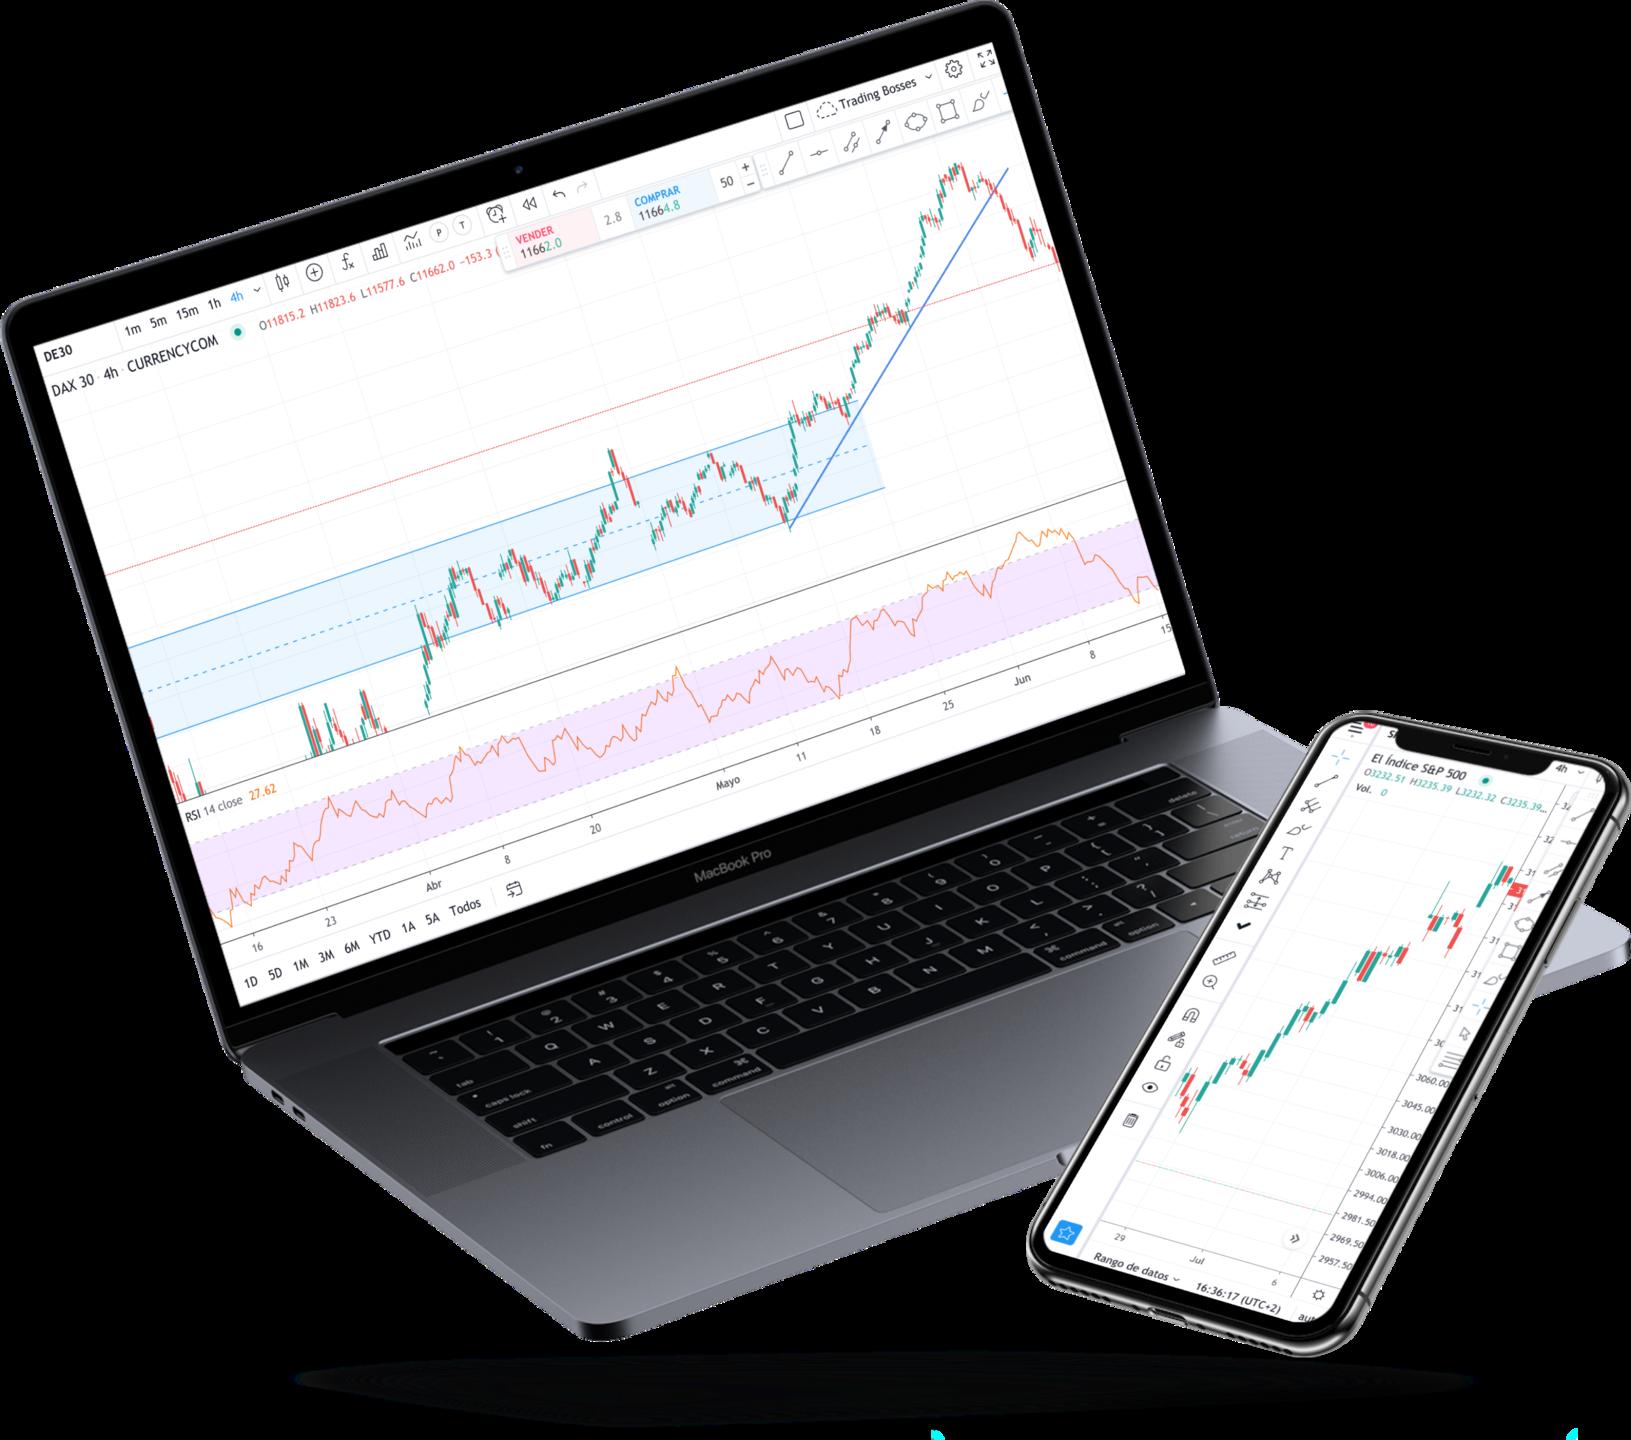 Macbook iphone trading